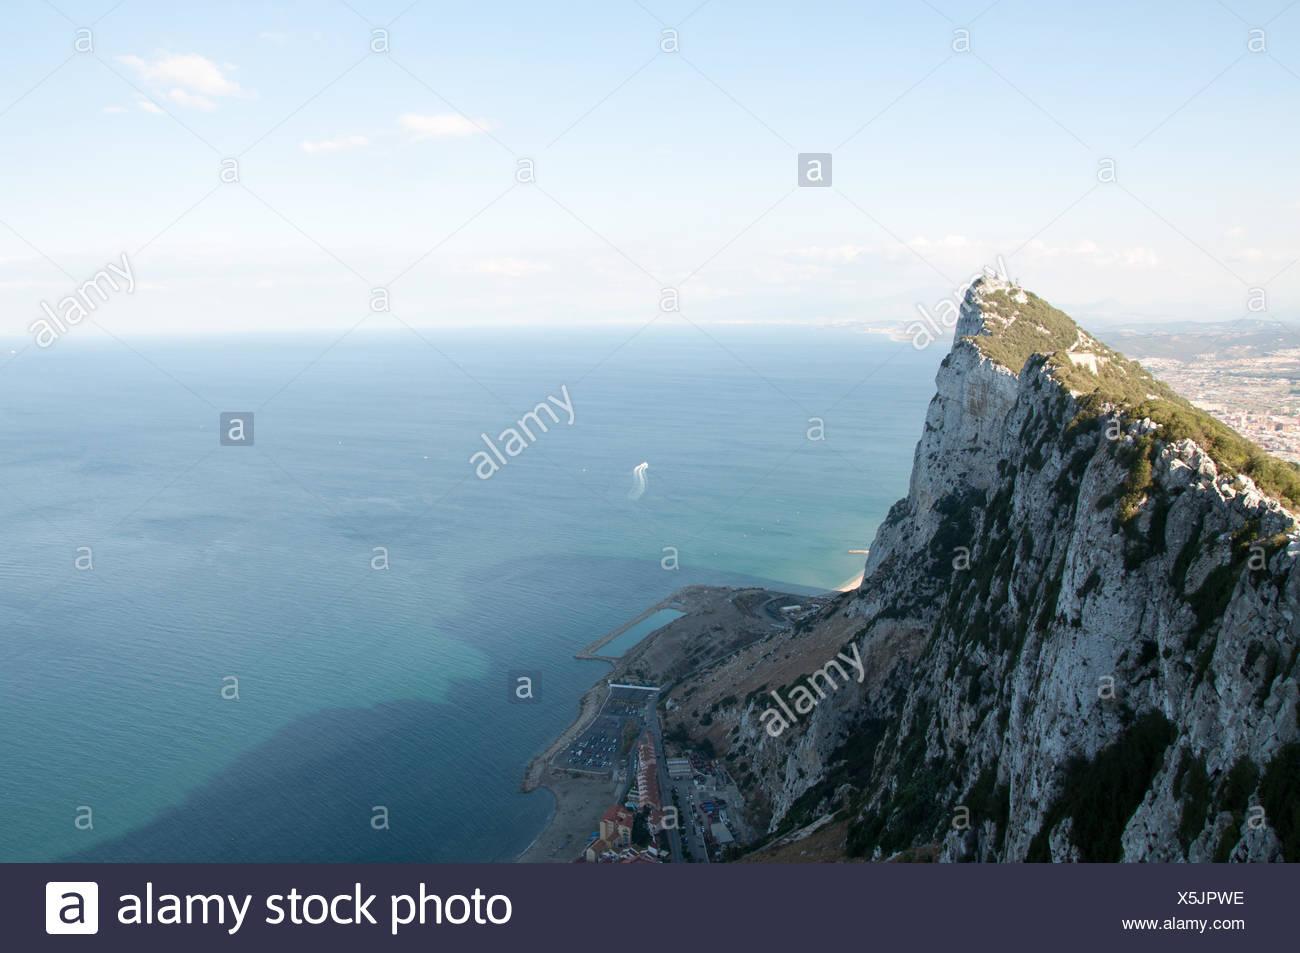 spain, water, mediterranean, salt water, sea, ocean, colony, gibraltar, strait, - Stock Image